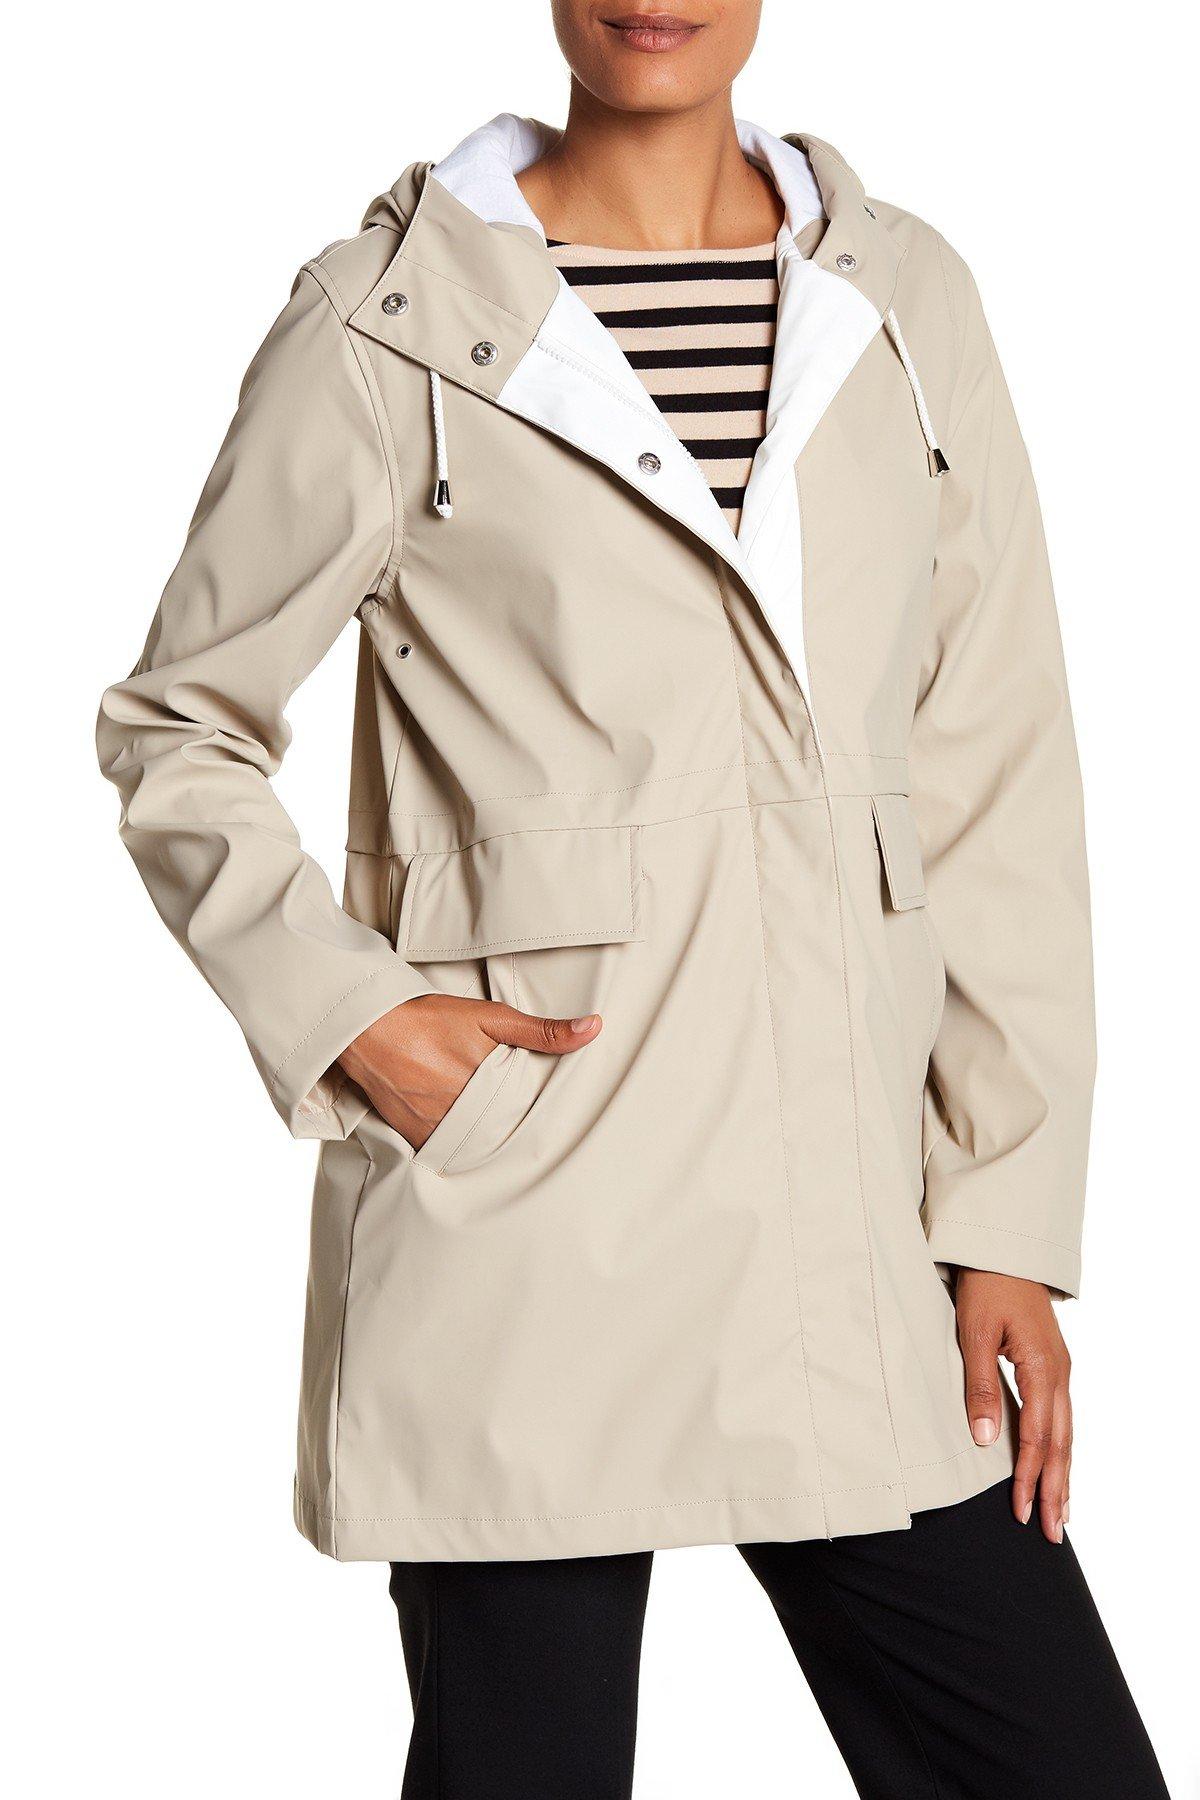 trench coats for women rachel rachel roy - hooded slicker AOAKHWZ